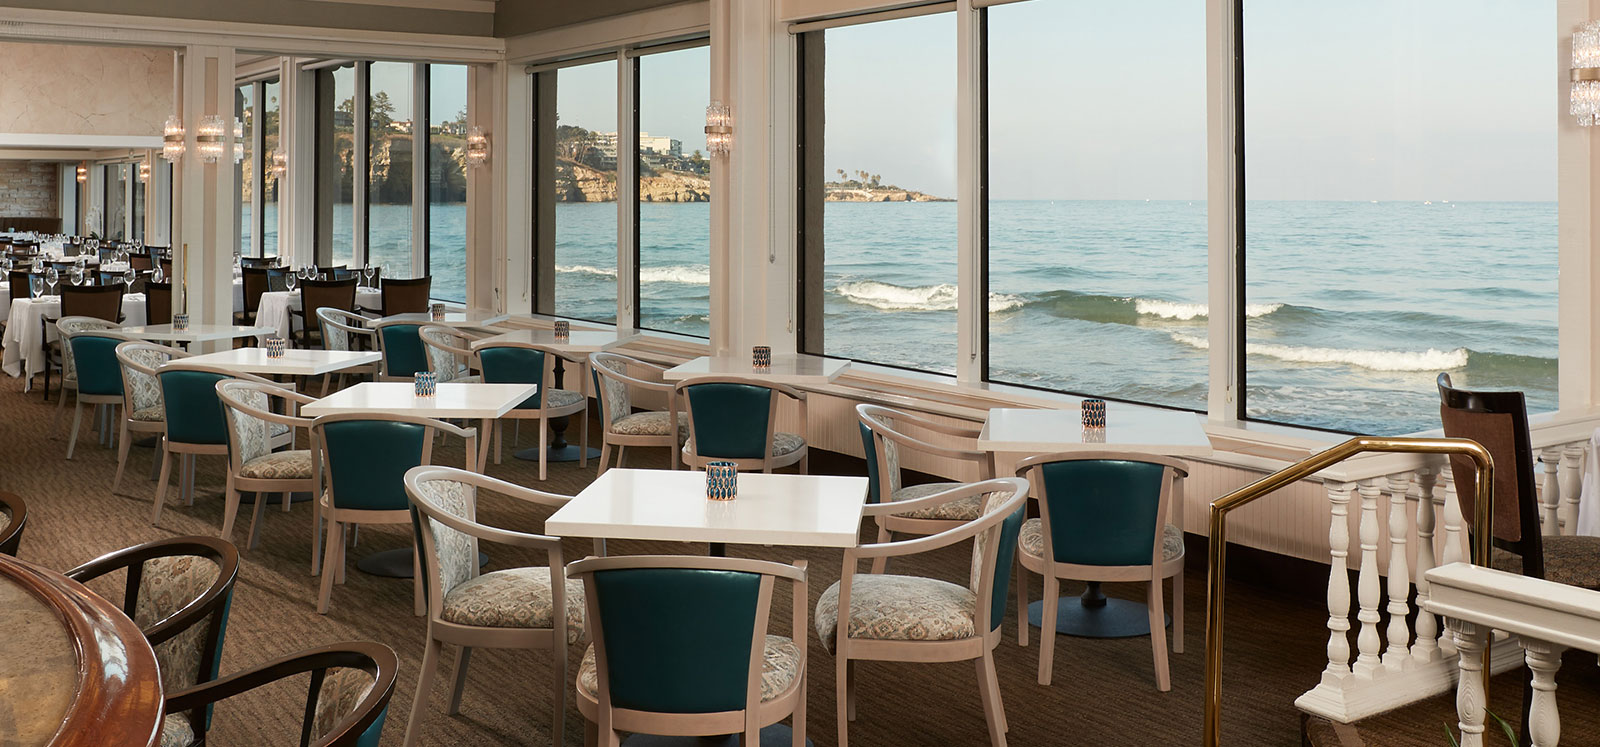 The Marine Room Restaurant In La Jolla